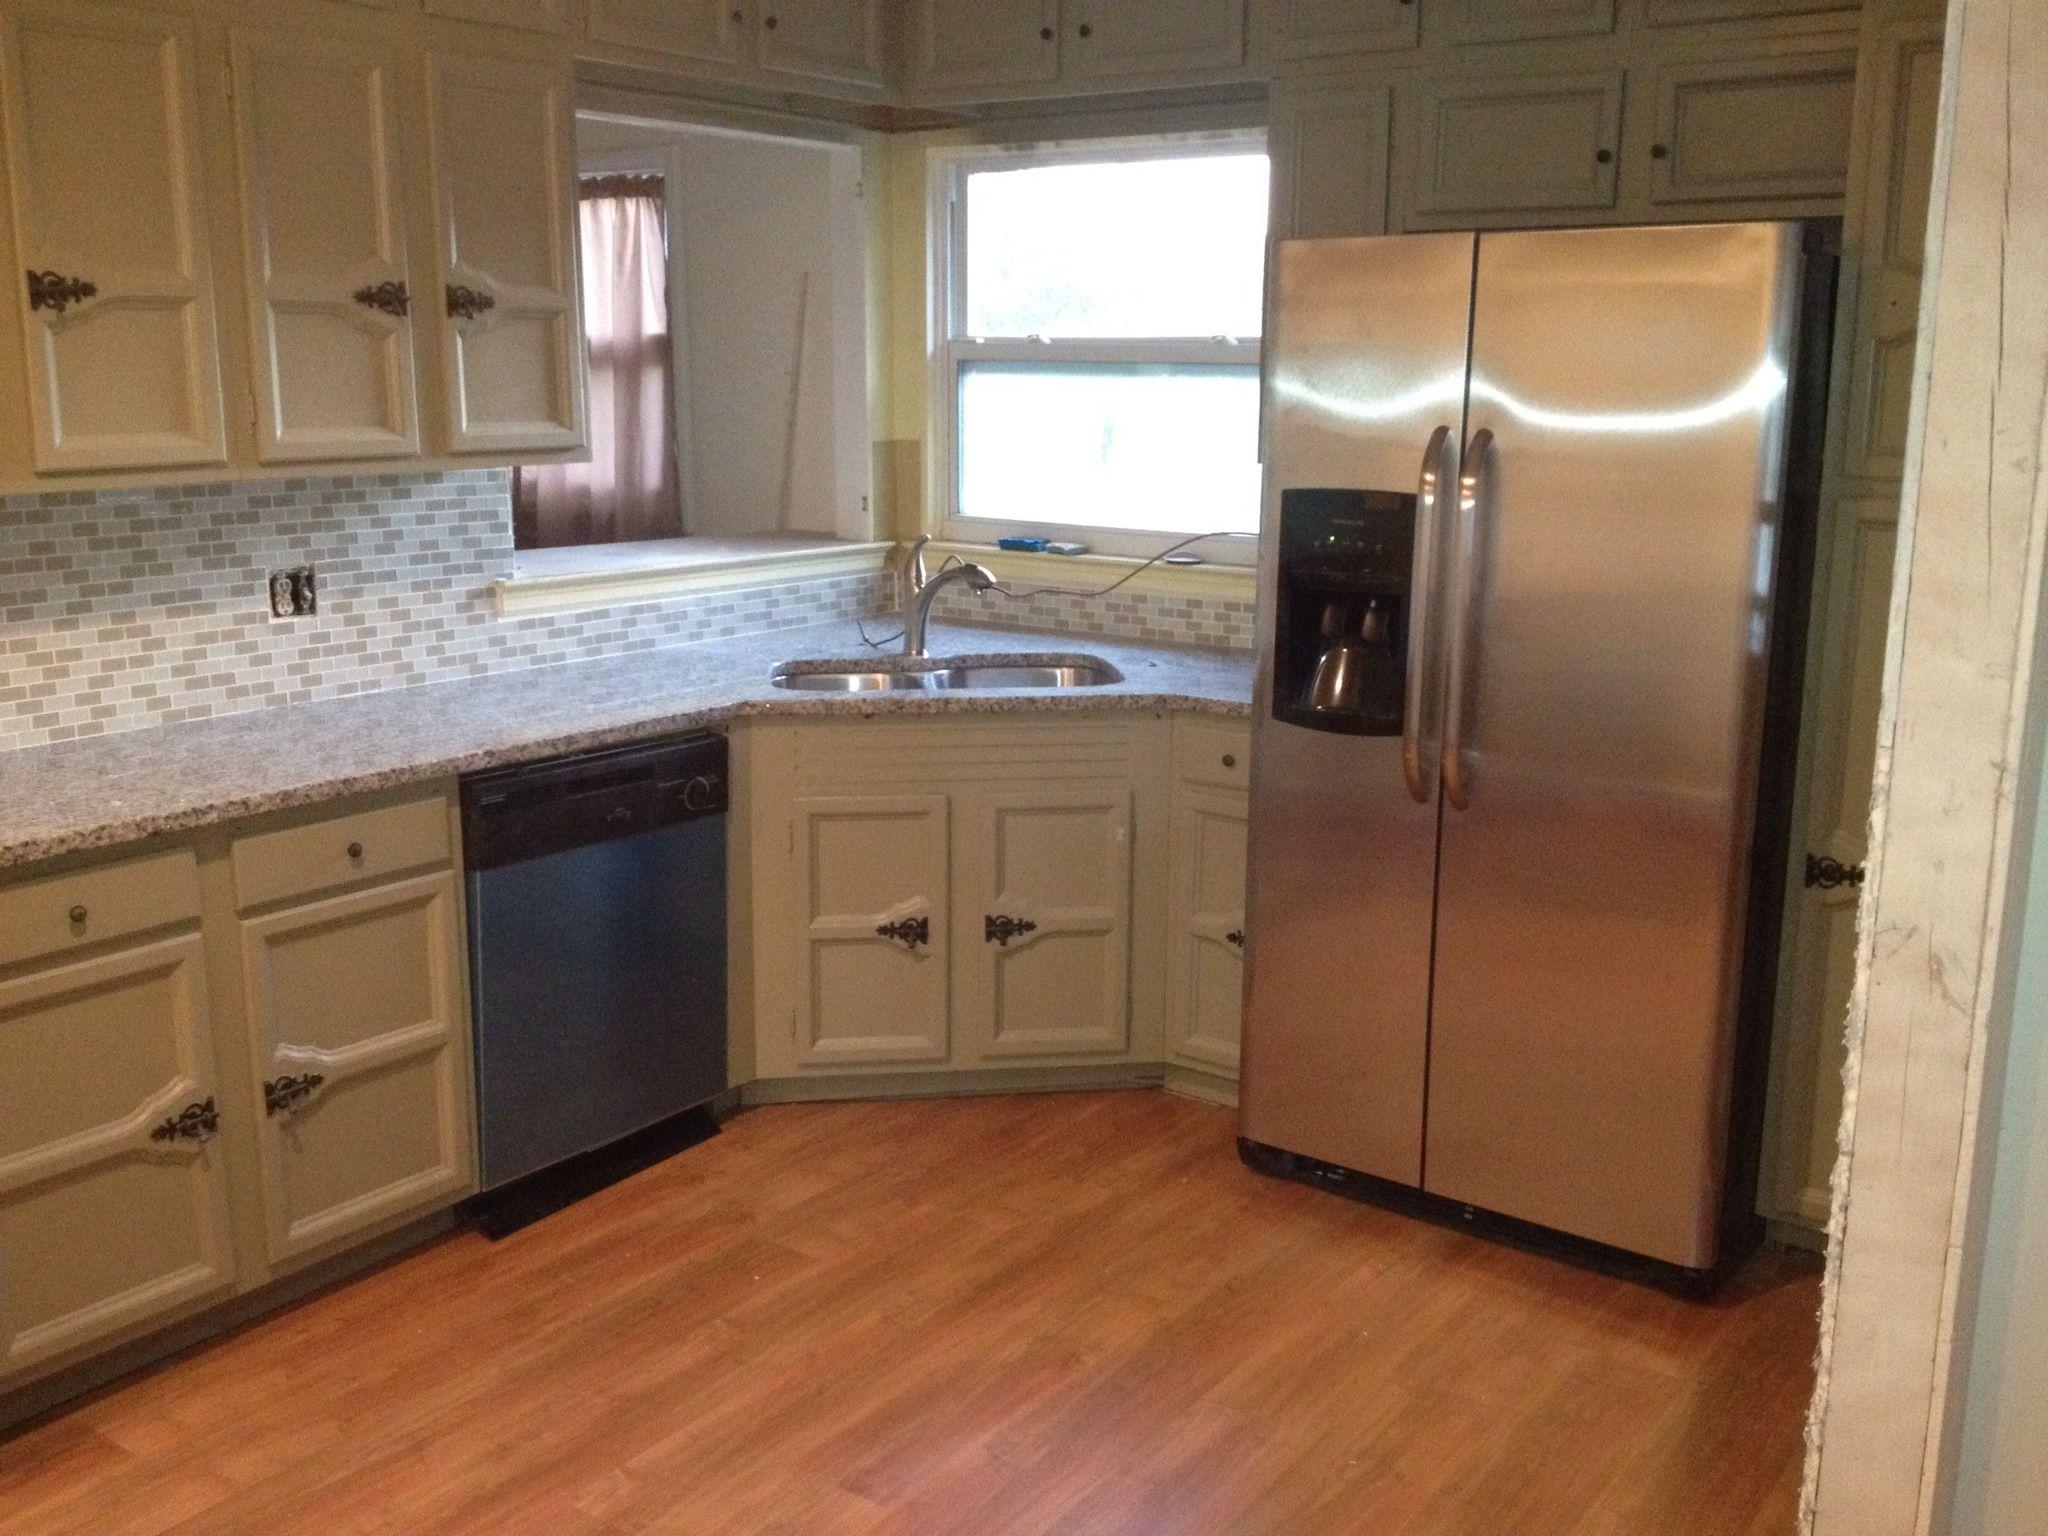 Kitchen Design Taupe And White Azul Platino Granite